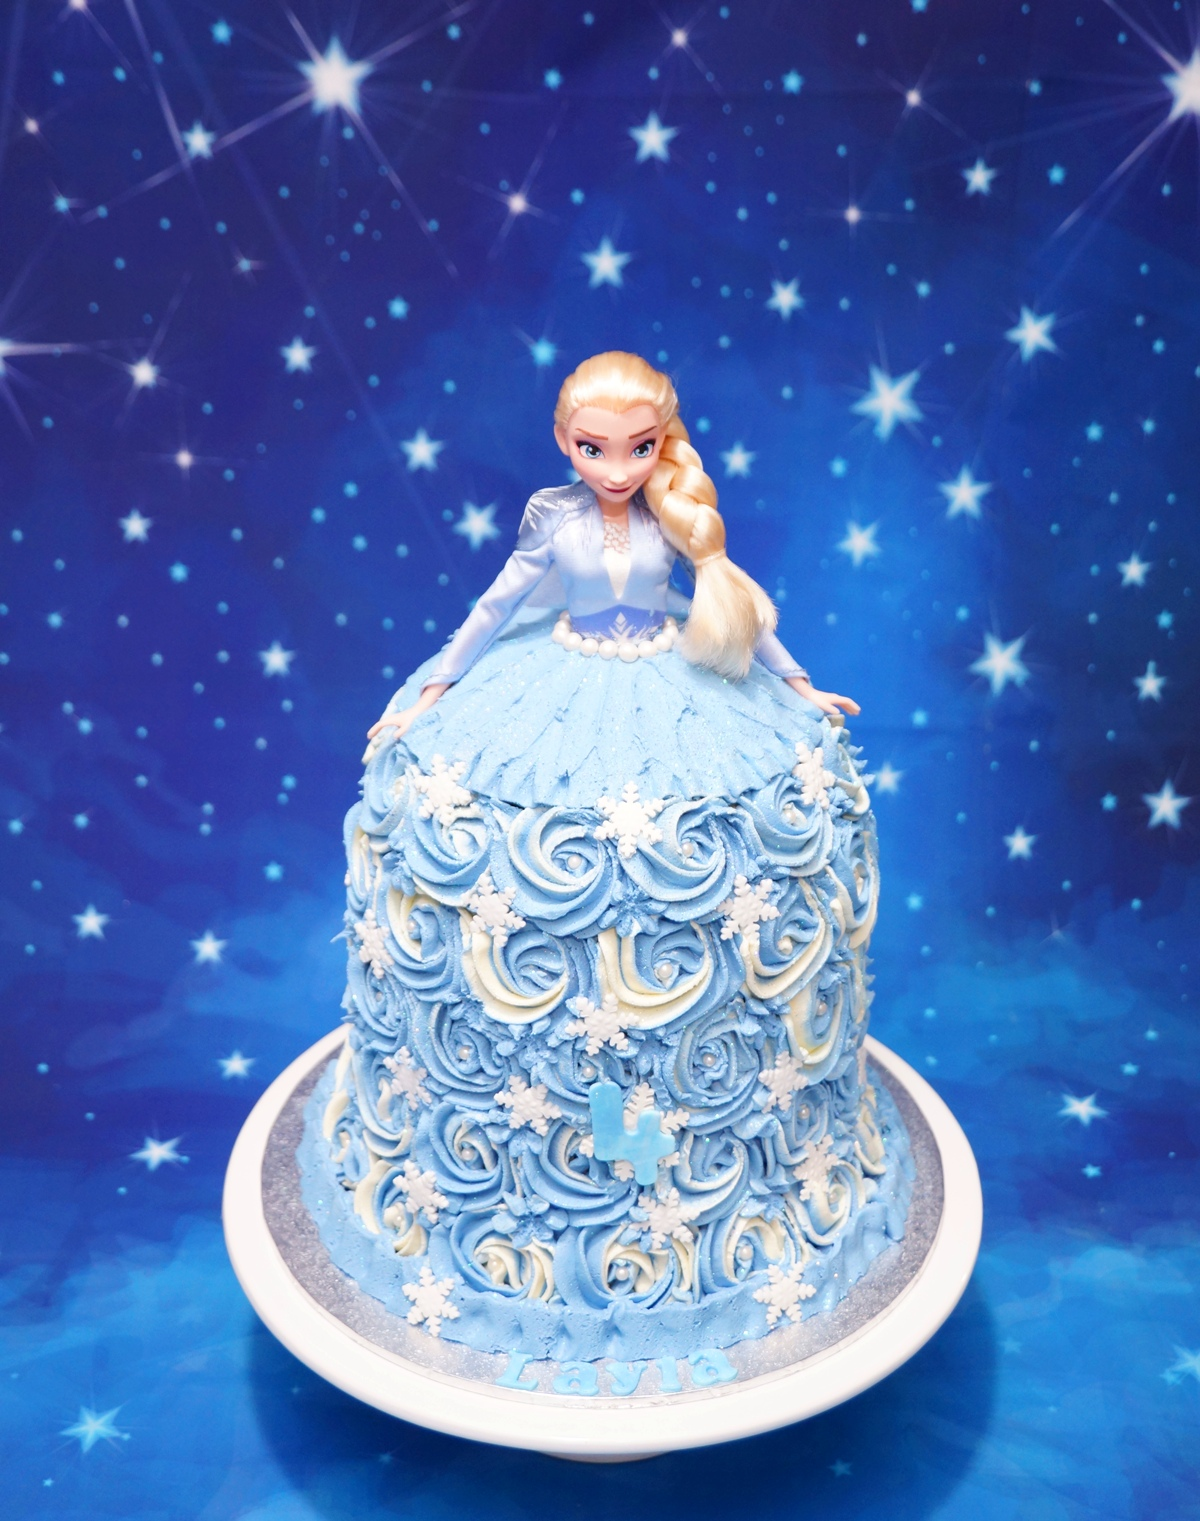 Elsa Dolly Varden 1